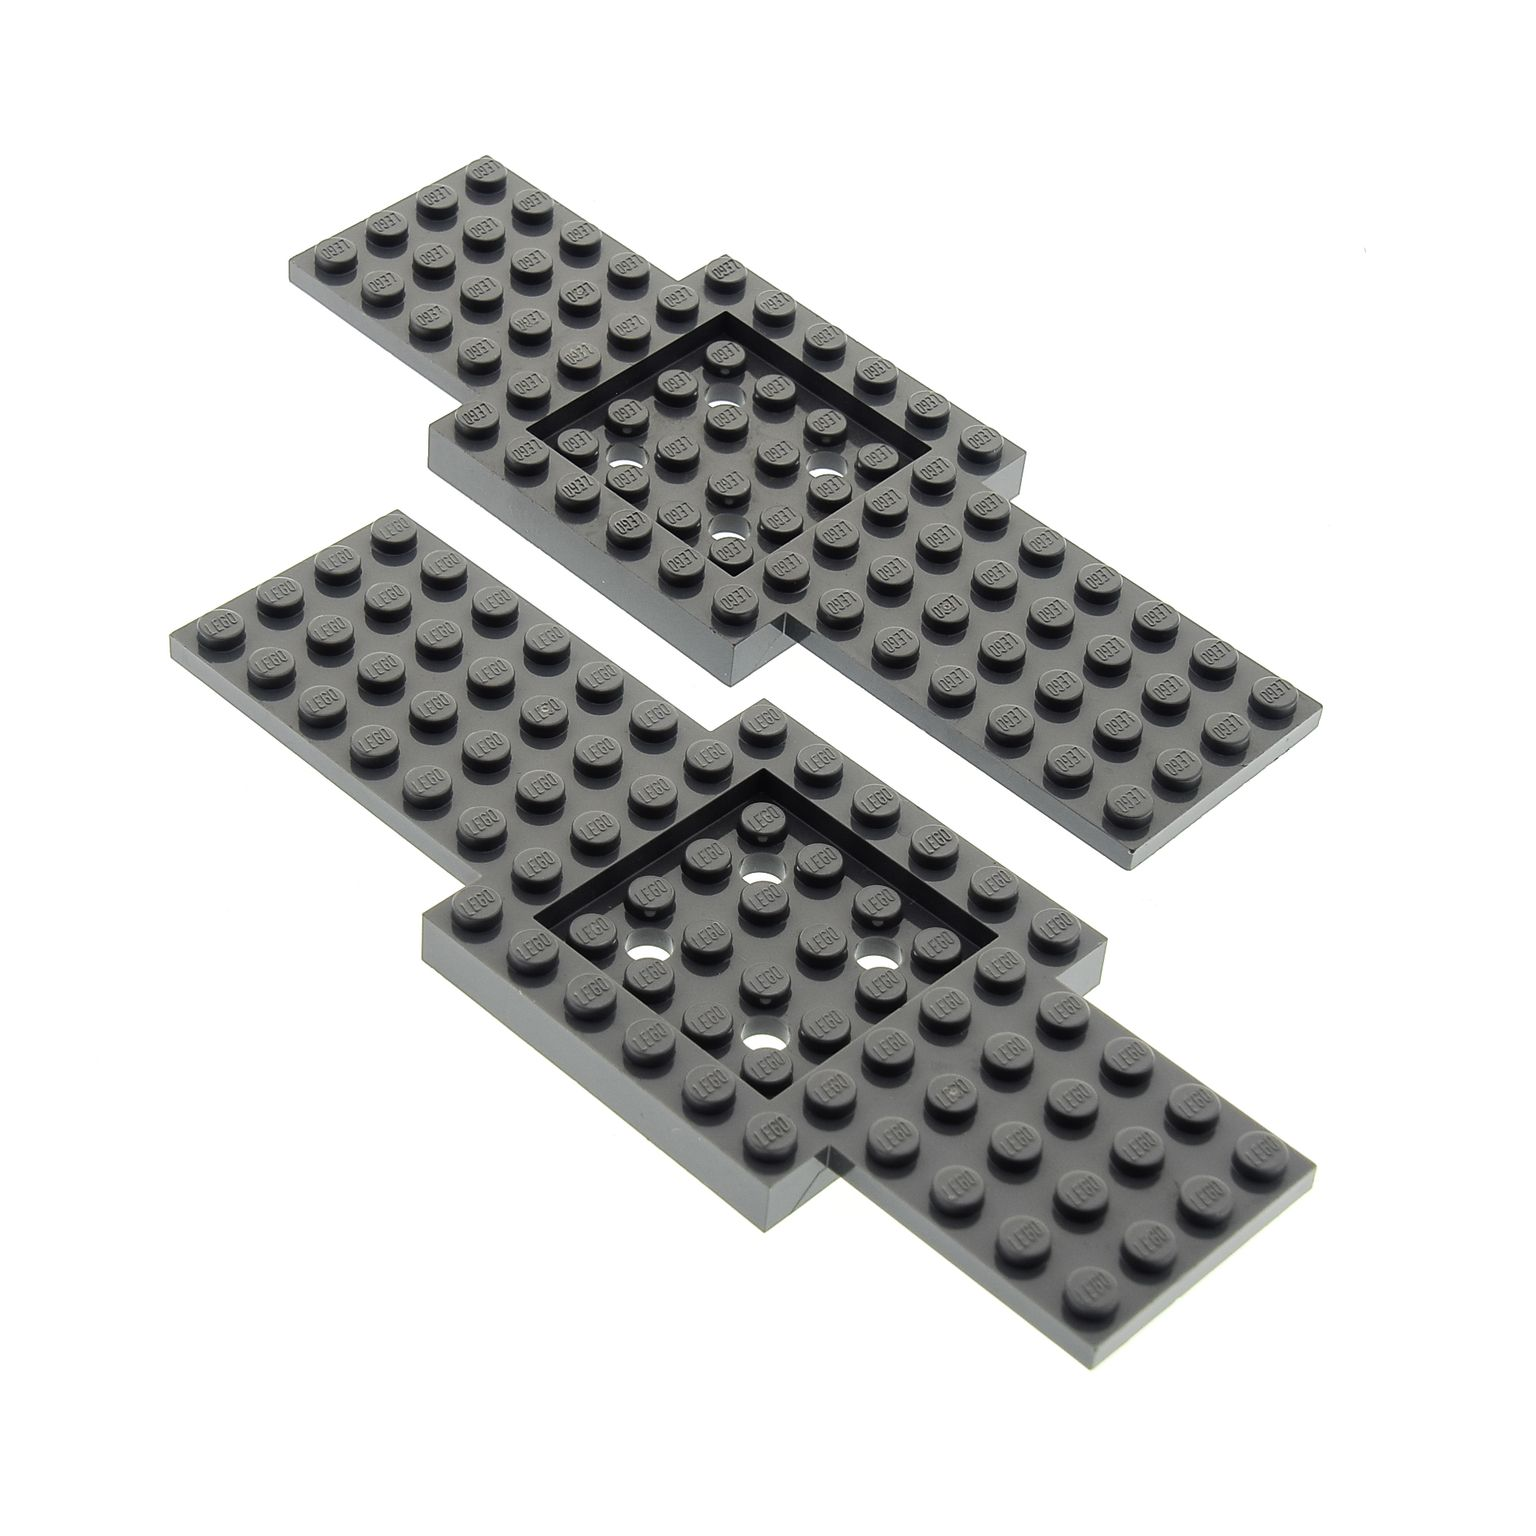 2x Lego Wing Plate Black 6x12 4143181 4143180 30356 30355